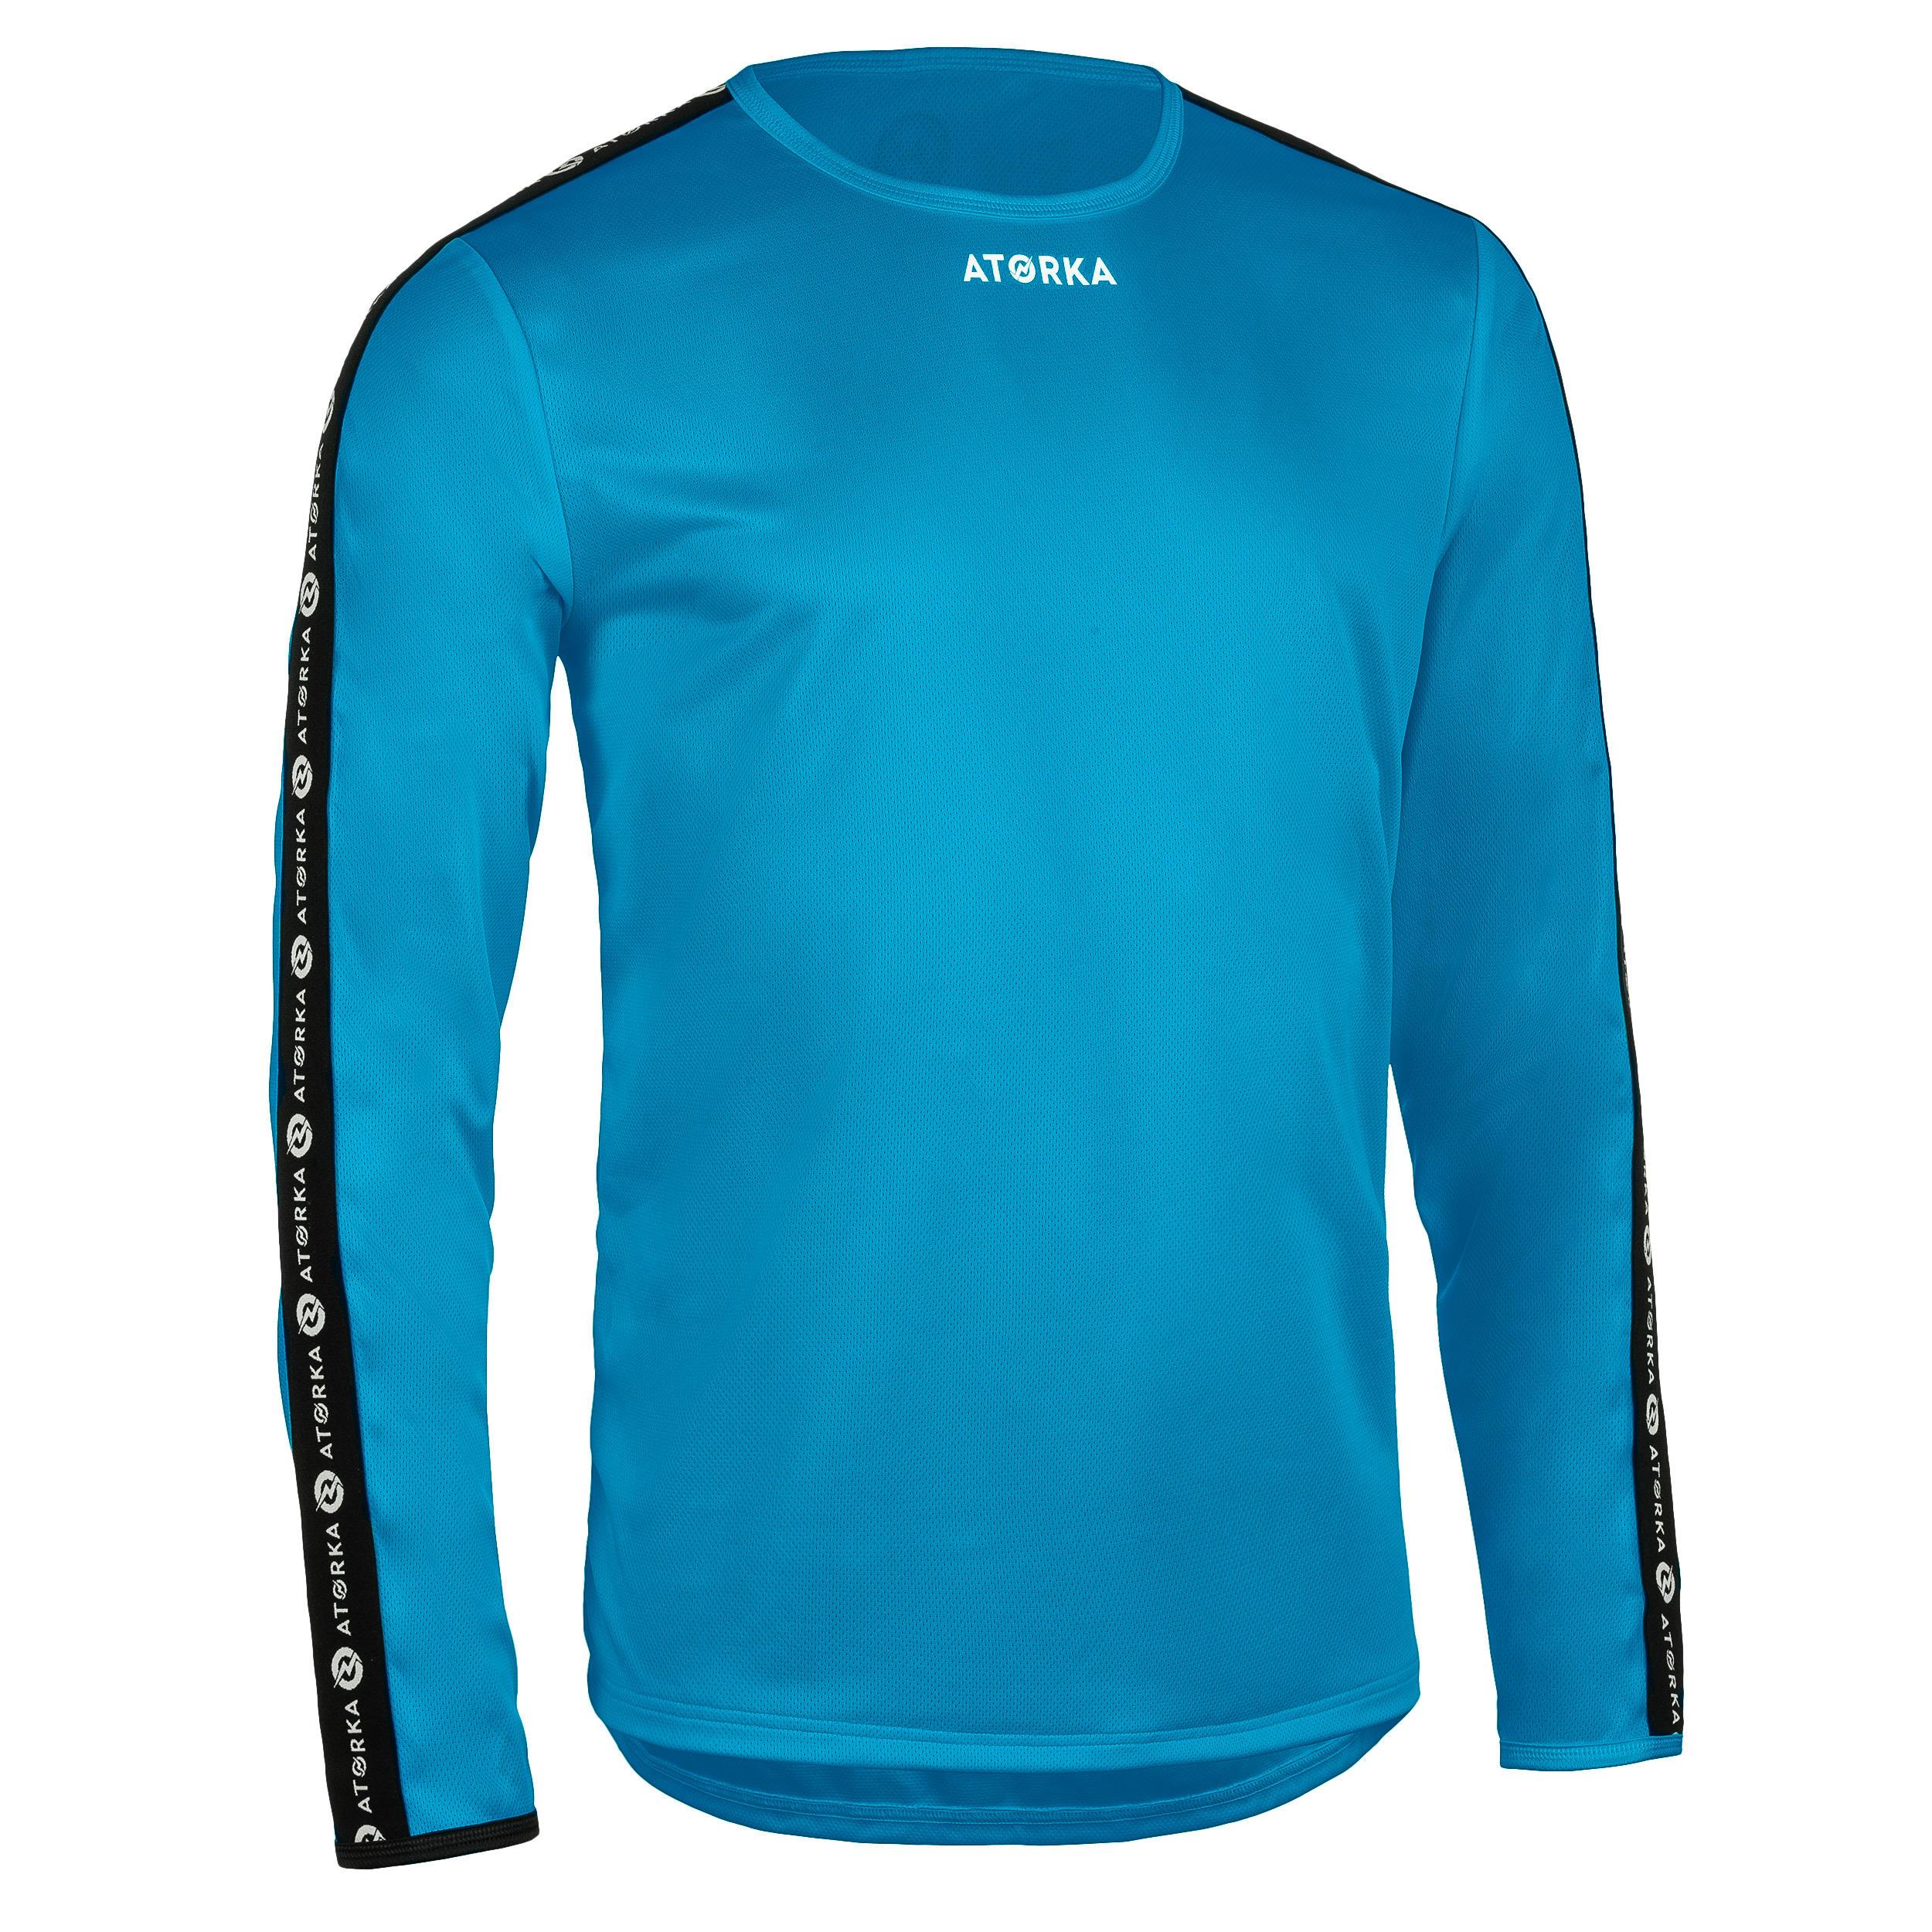 Maillot manche longue de handball homme h100c bleu clair atorka